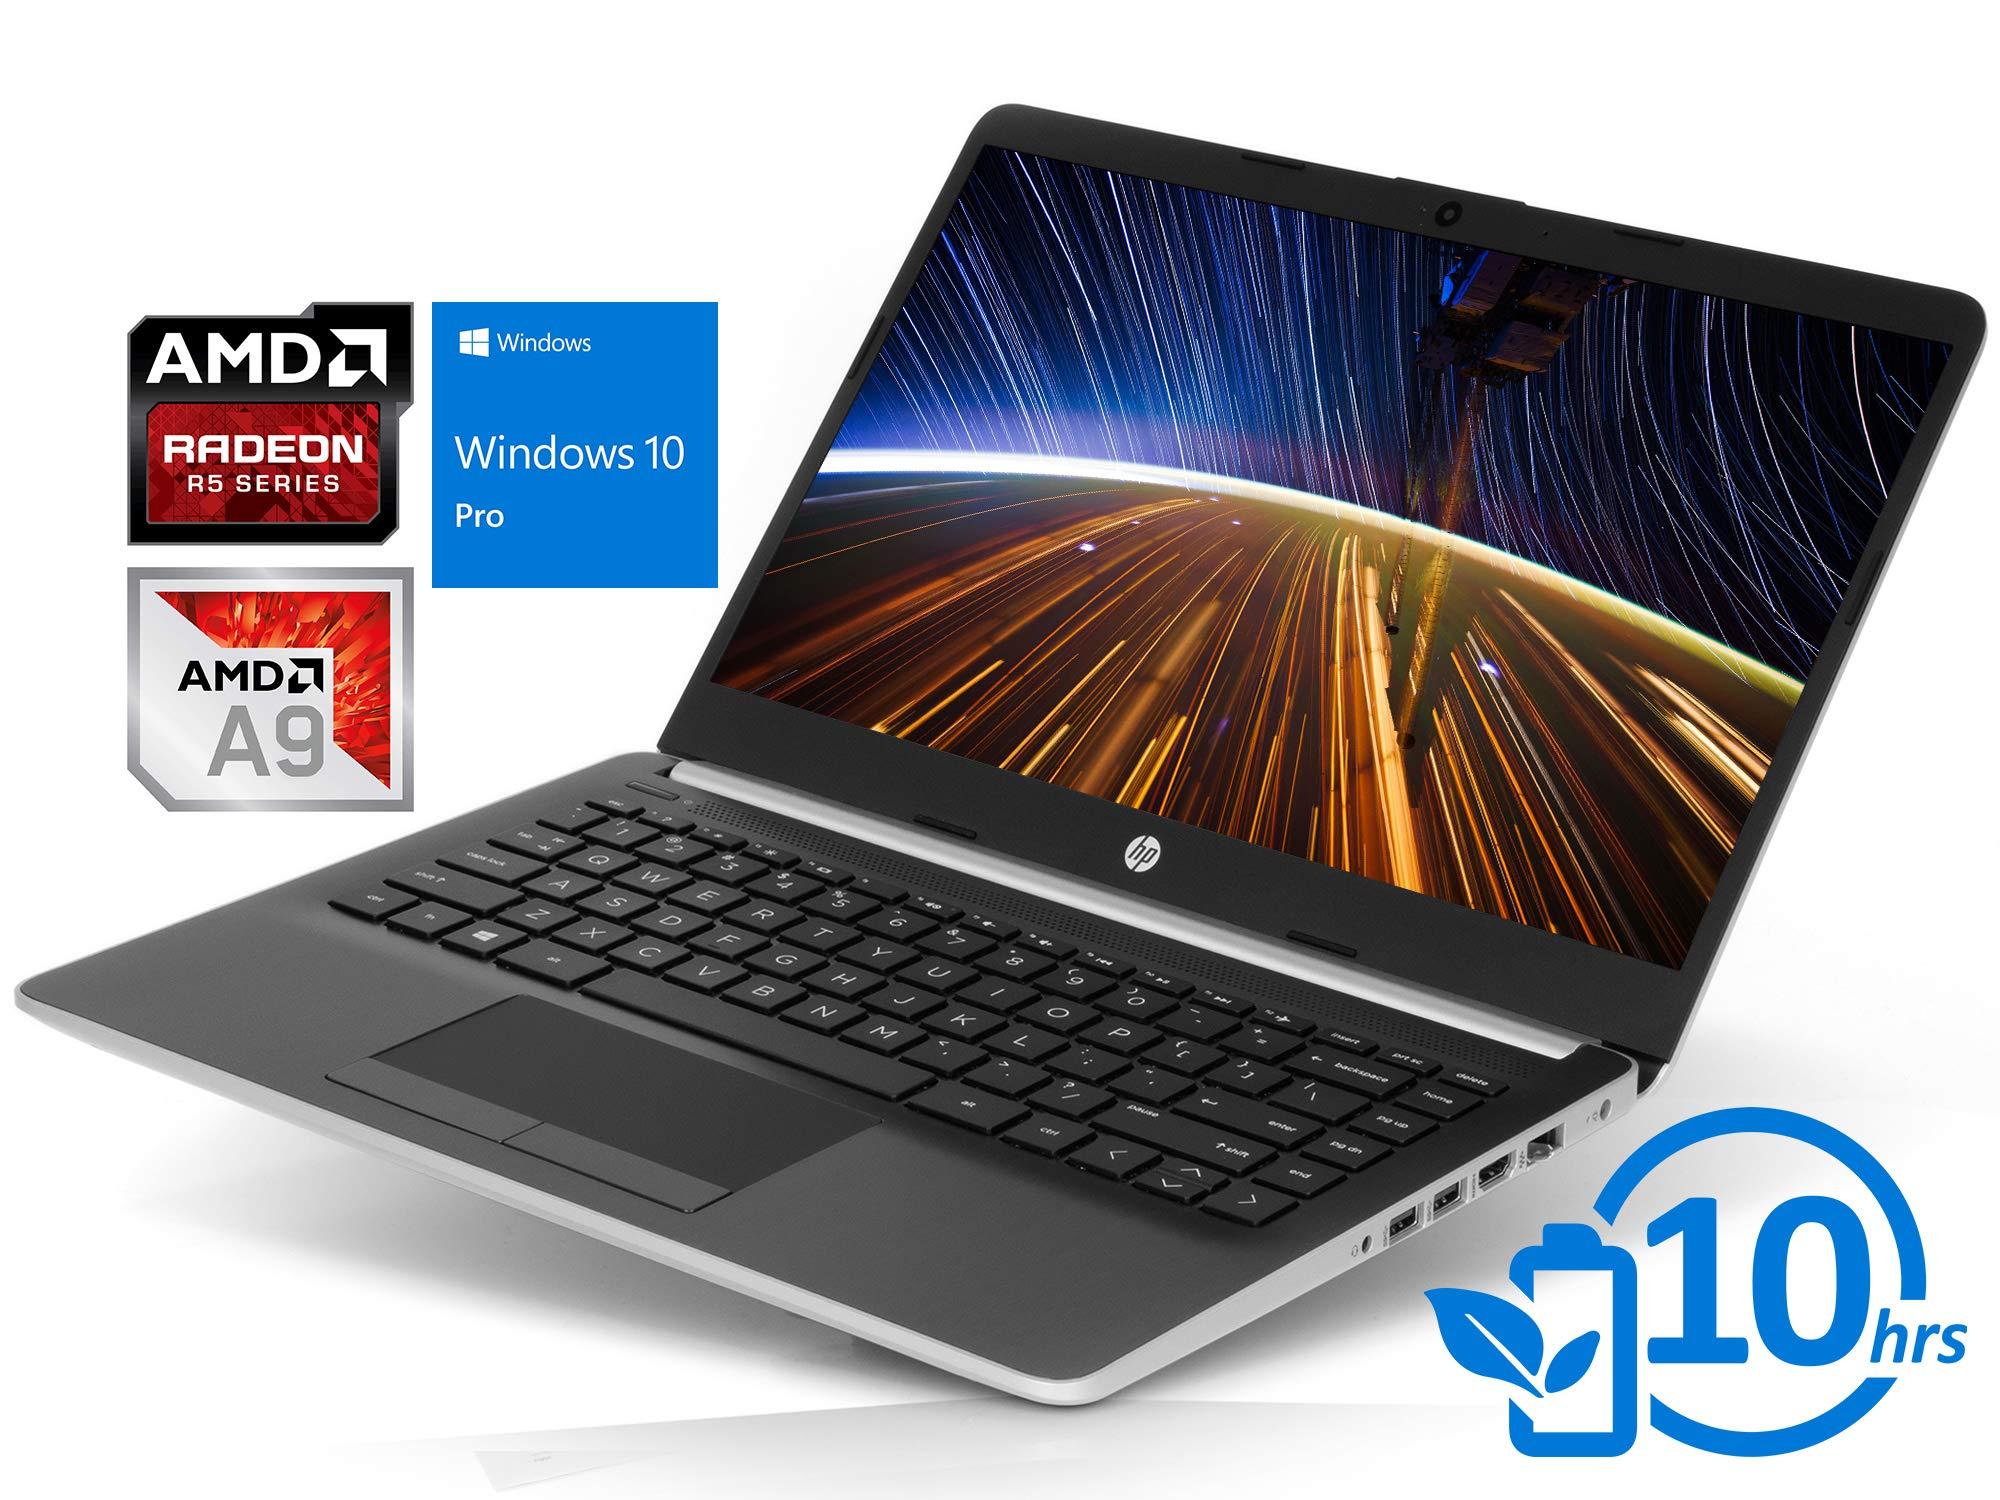 "HP 14 Laptop, 14"" HD Display, AMD A9-9425 Upto 3.7GHz, 16GB RAM, 1TB NVMe SSD, HDMI, Card Reader, Wi-Fi, Bluetooth, Windows 10 Pro S"